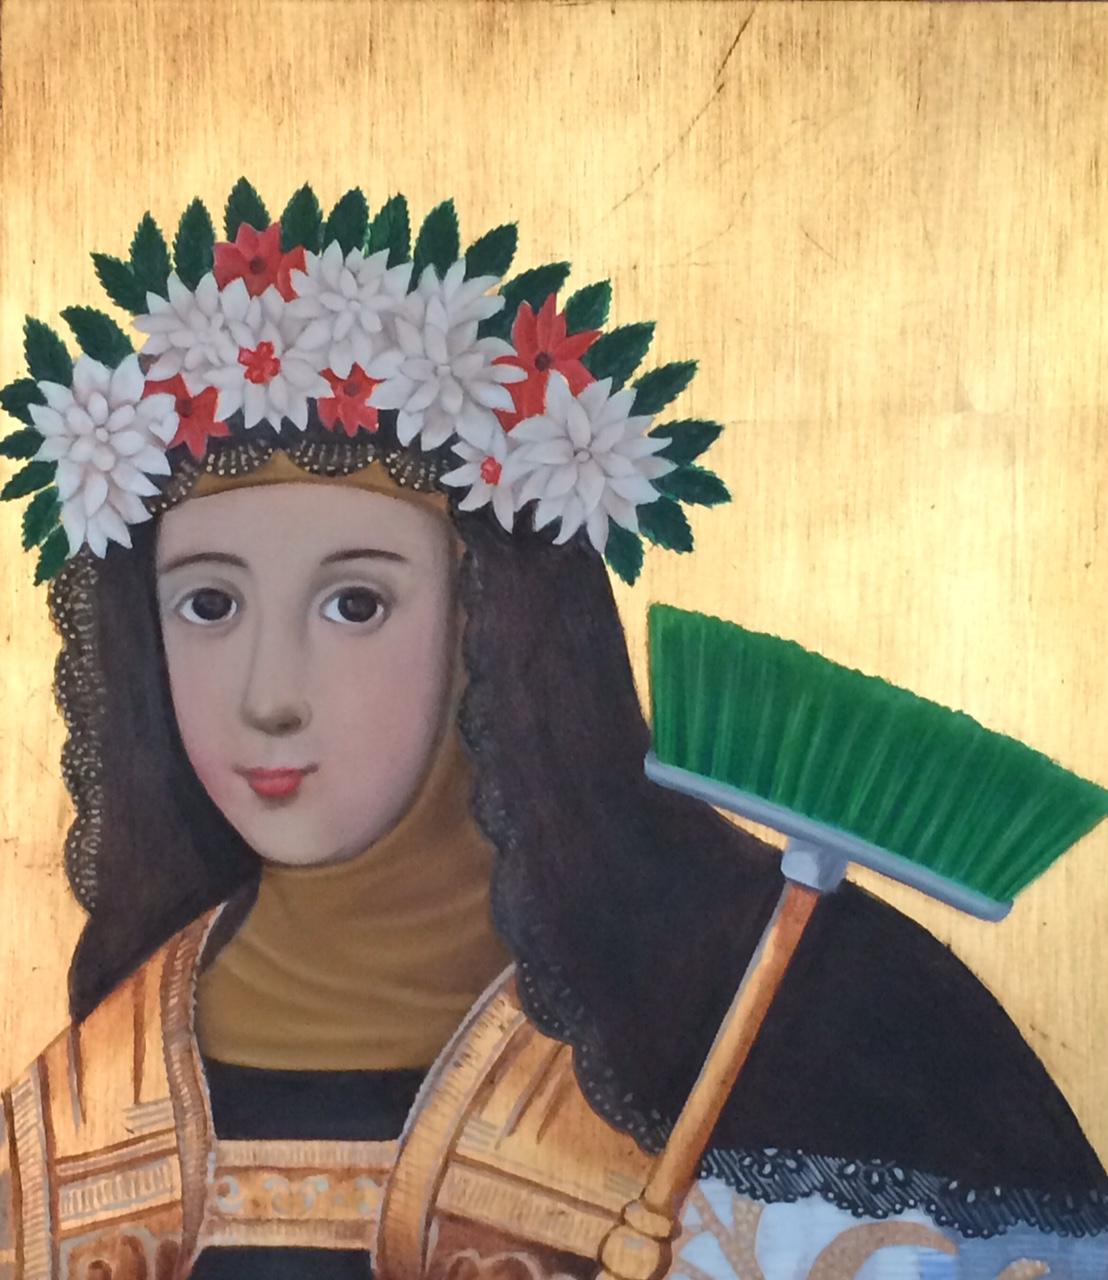 Santa Clara, de la serie Santo Oficio. EN-BOLA-ATADOS. Óleo sobre madera con hojilla dorada. 38 x 33 cms. 2015